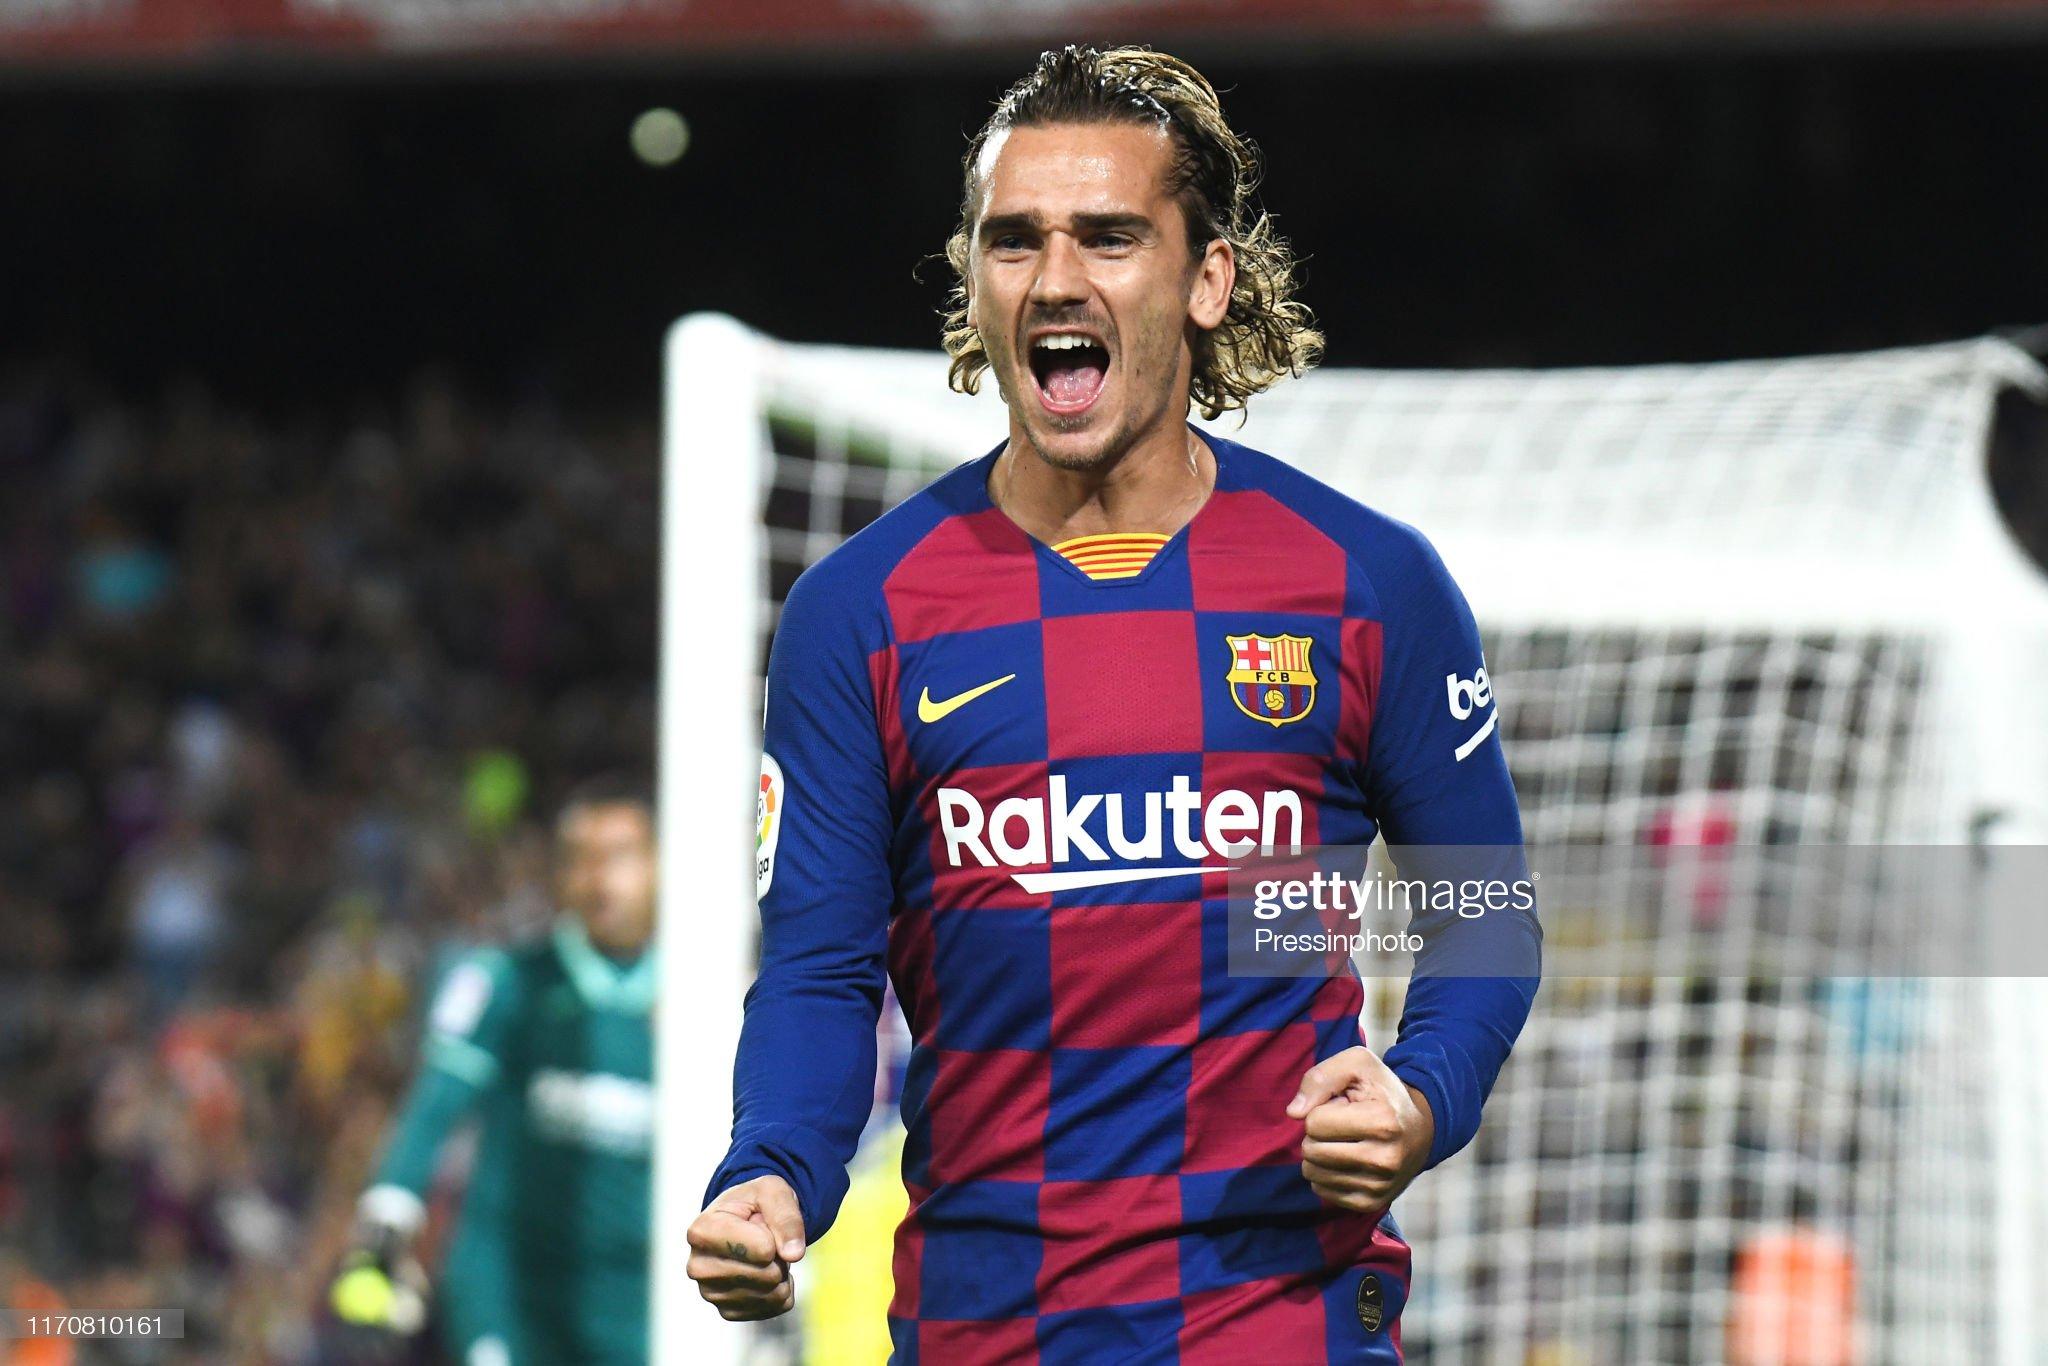 صور مباراة : برشلونة - فياريال 2-1 ( 24-09-2019 )  Antoine-griezmann-of-fc-barcelona-celebrates-his-goal-during-the-liga-picture-id1170810161?s=2048x2048